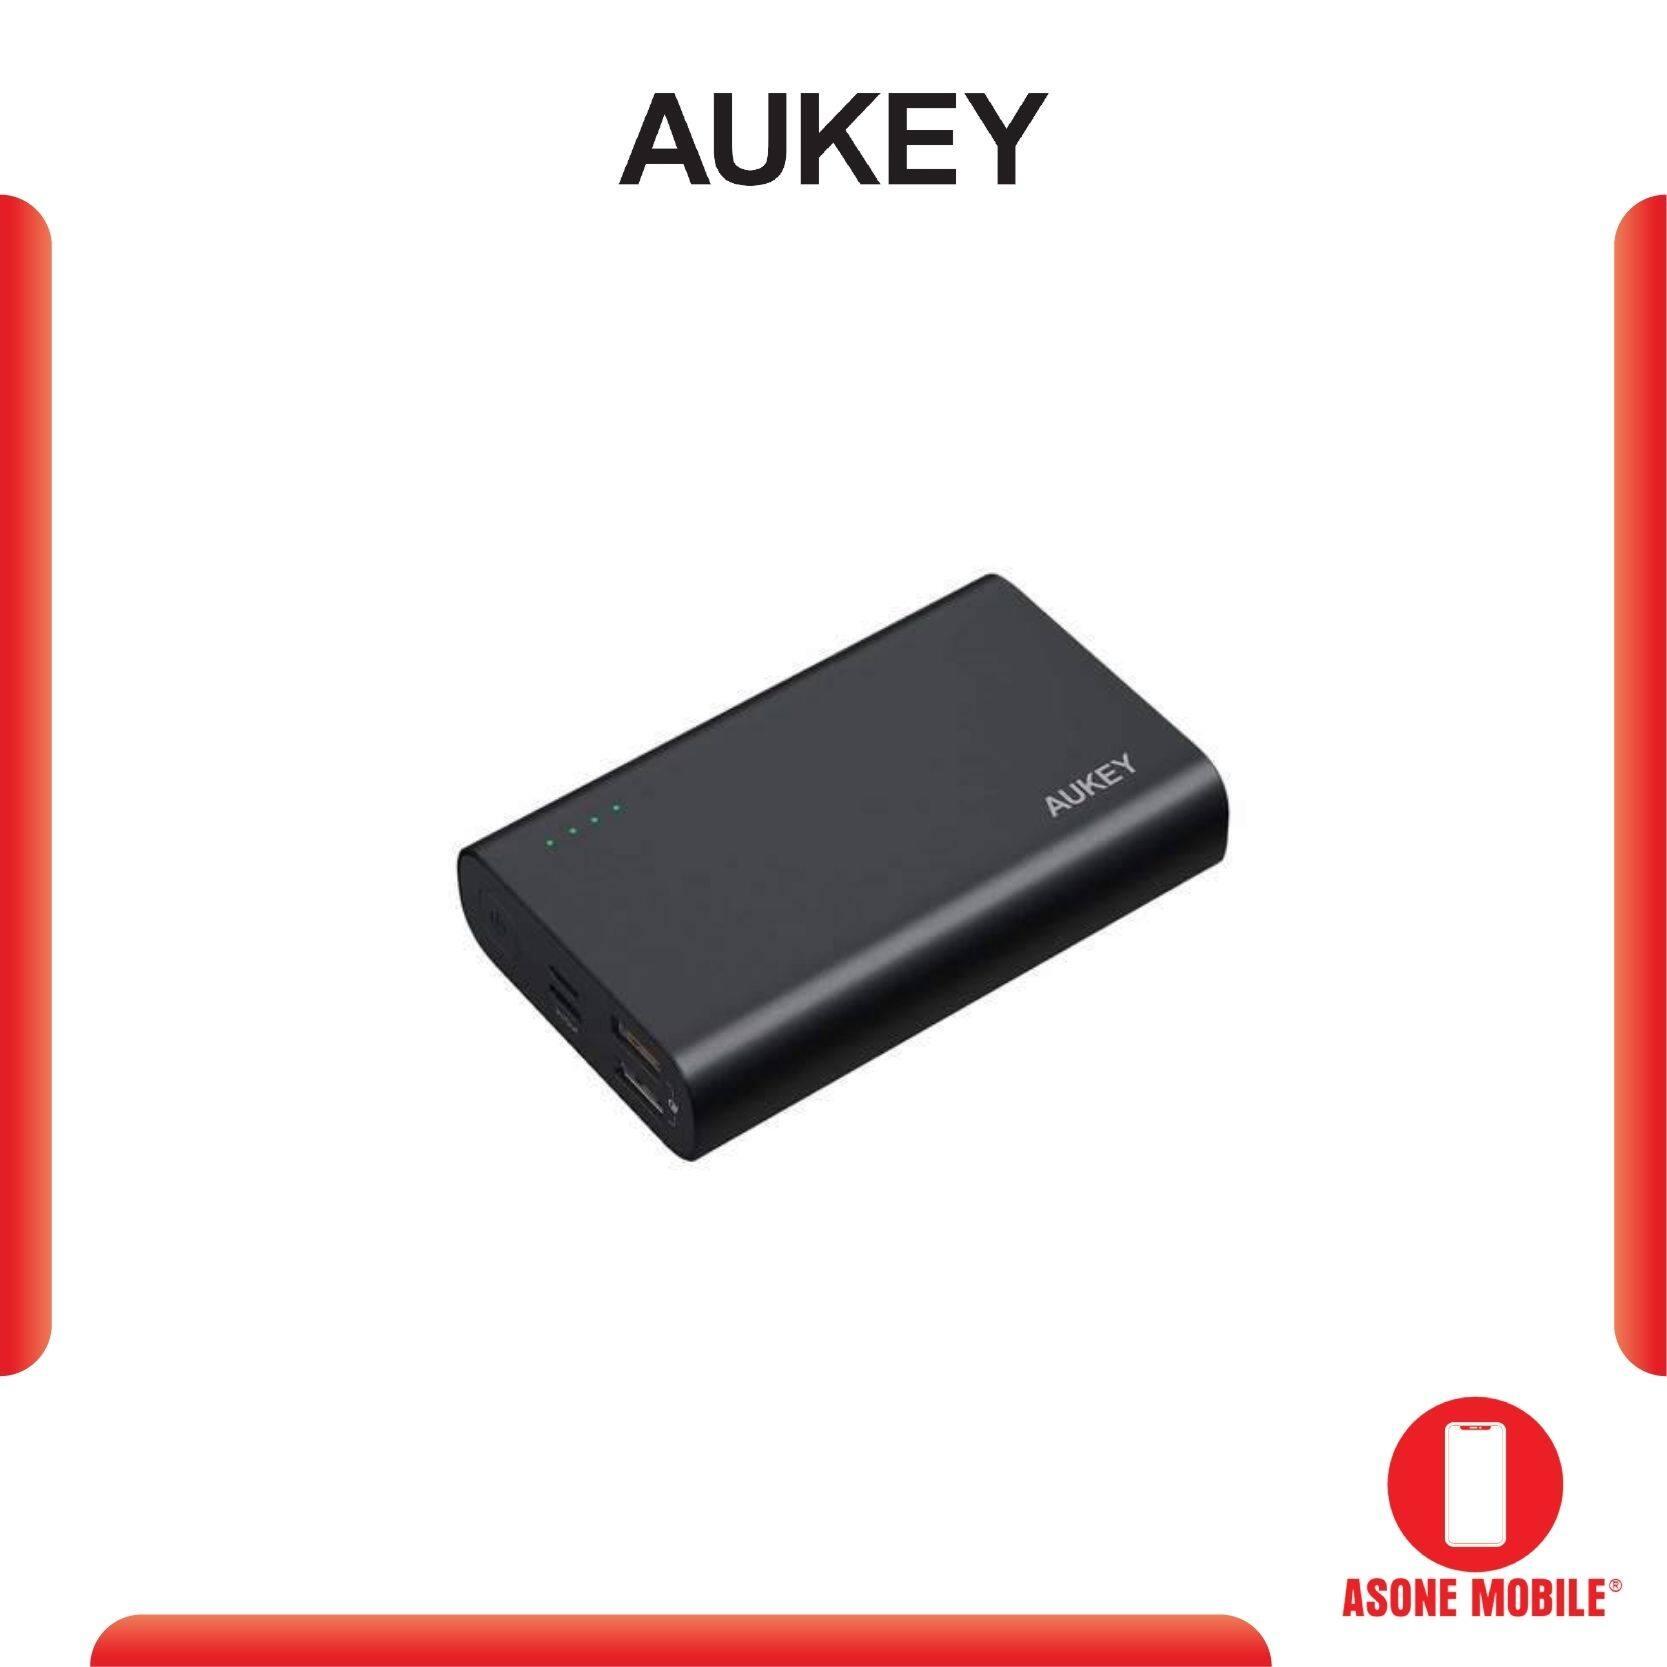 Original Aukey PB-XD12 USB C QC3.0 Power Delivery Power Bank (10000mAh) 2 year warranty